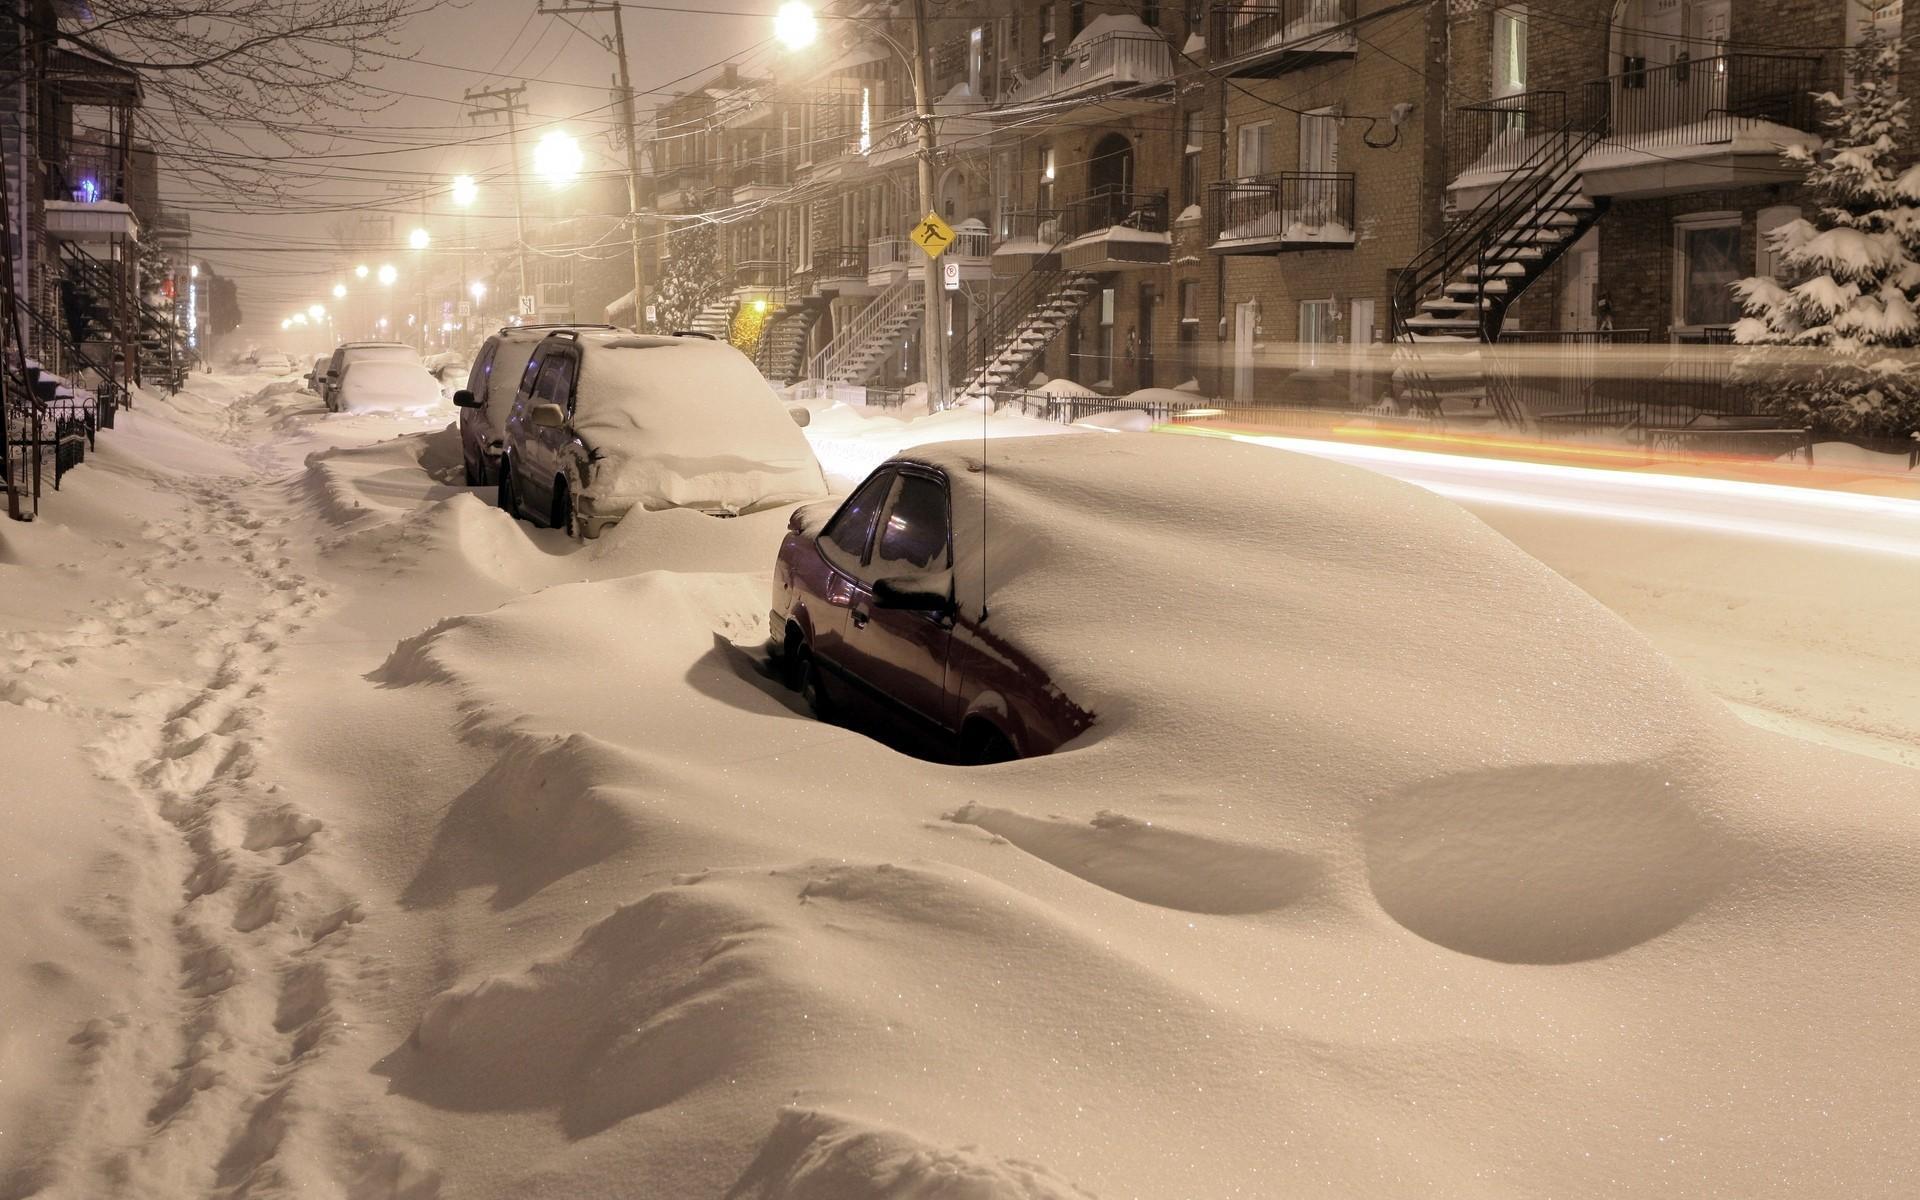 любим картинки много снега в городе фигура